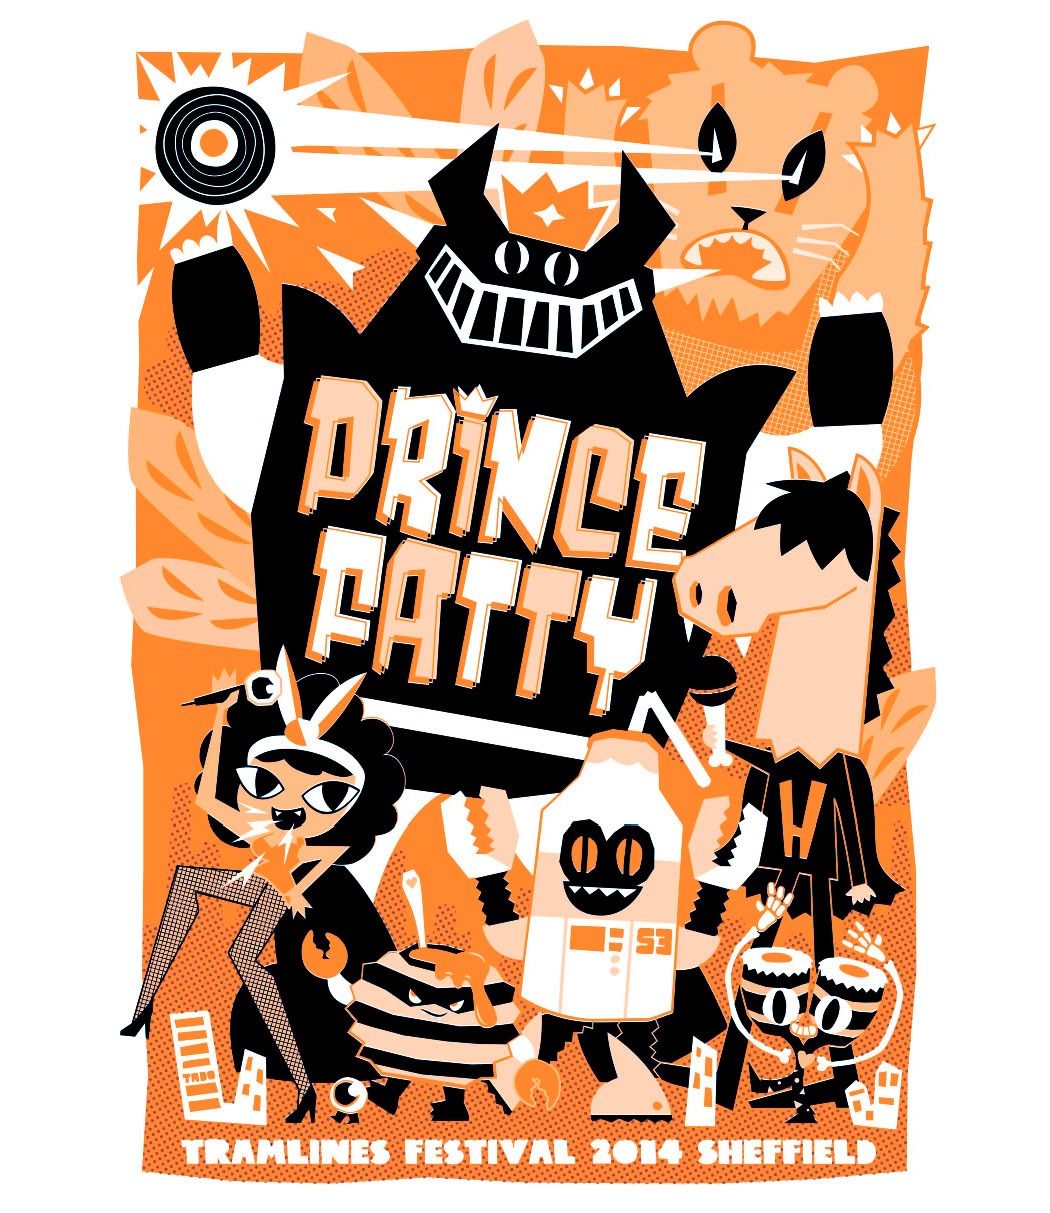 princefatty1050-2